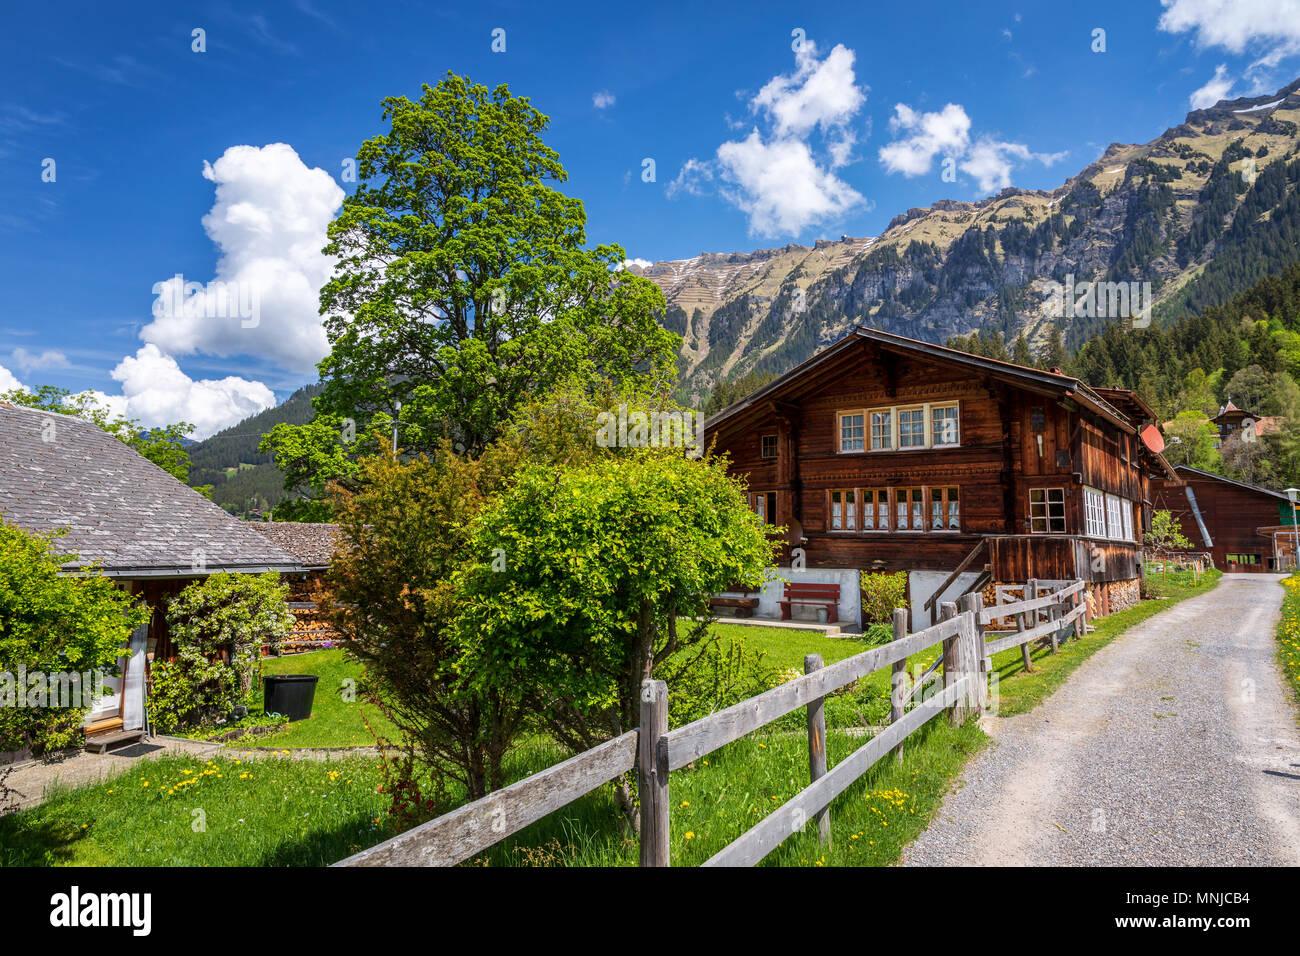 Traditional wooden house near Lauterbrunnen, Interlaken-Oberhasli, Bern, Switzerland - Stock Image